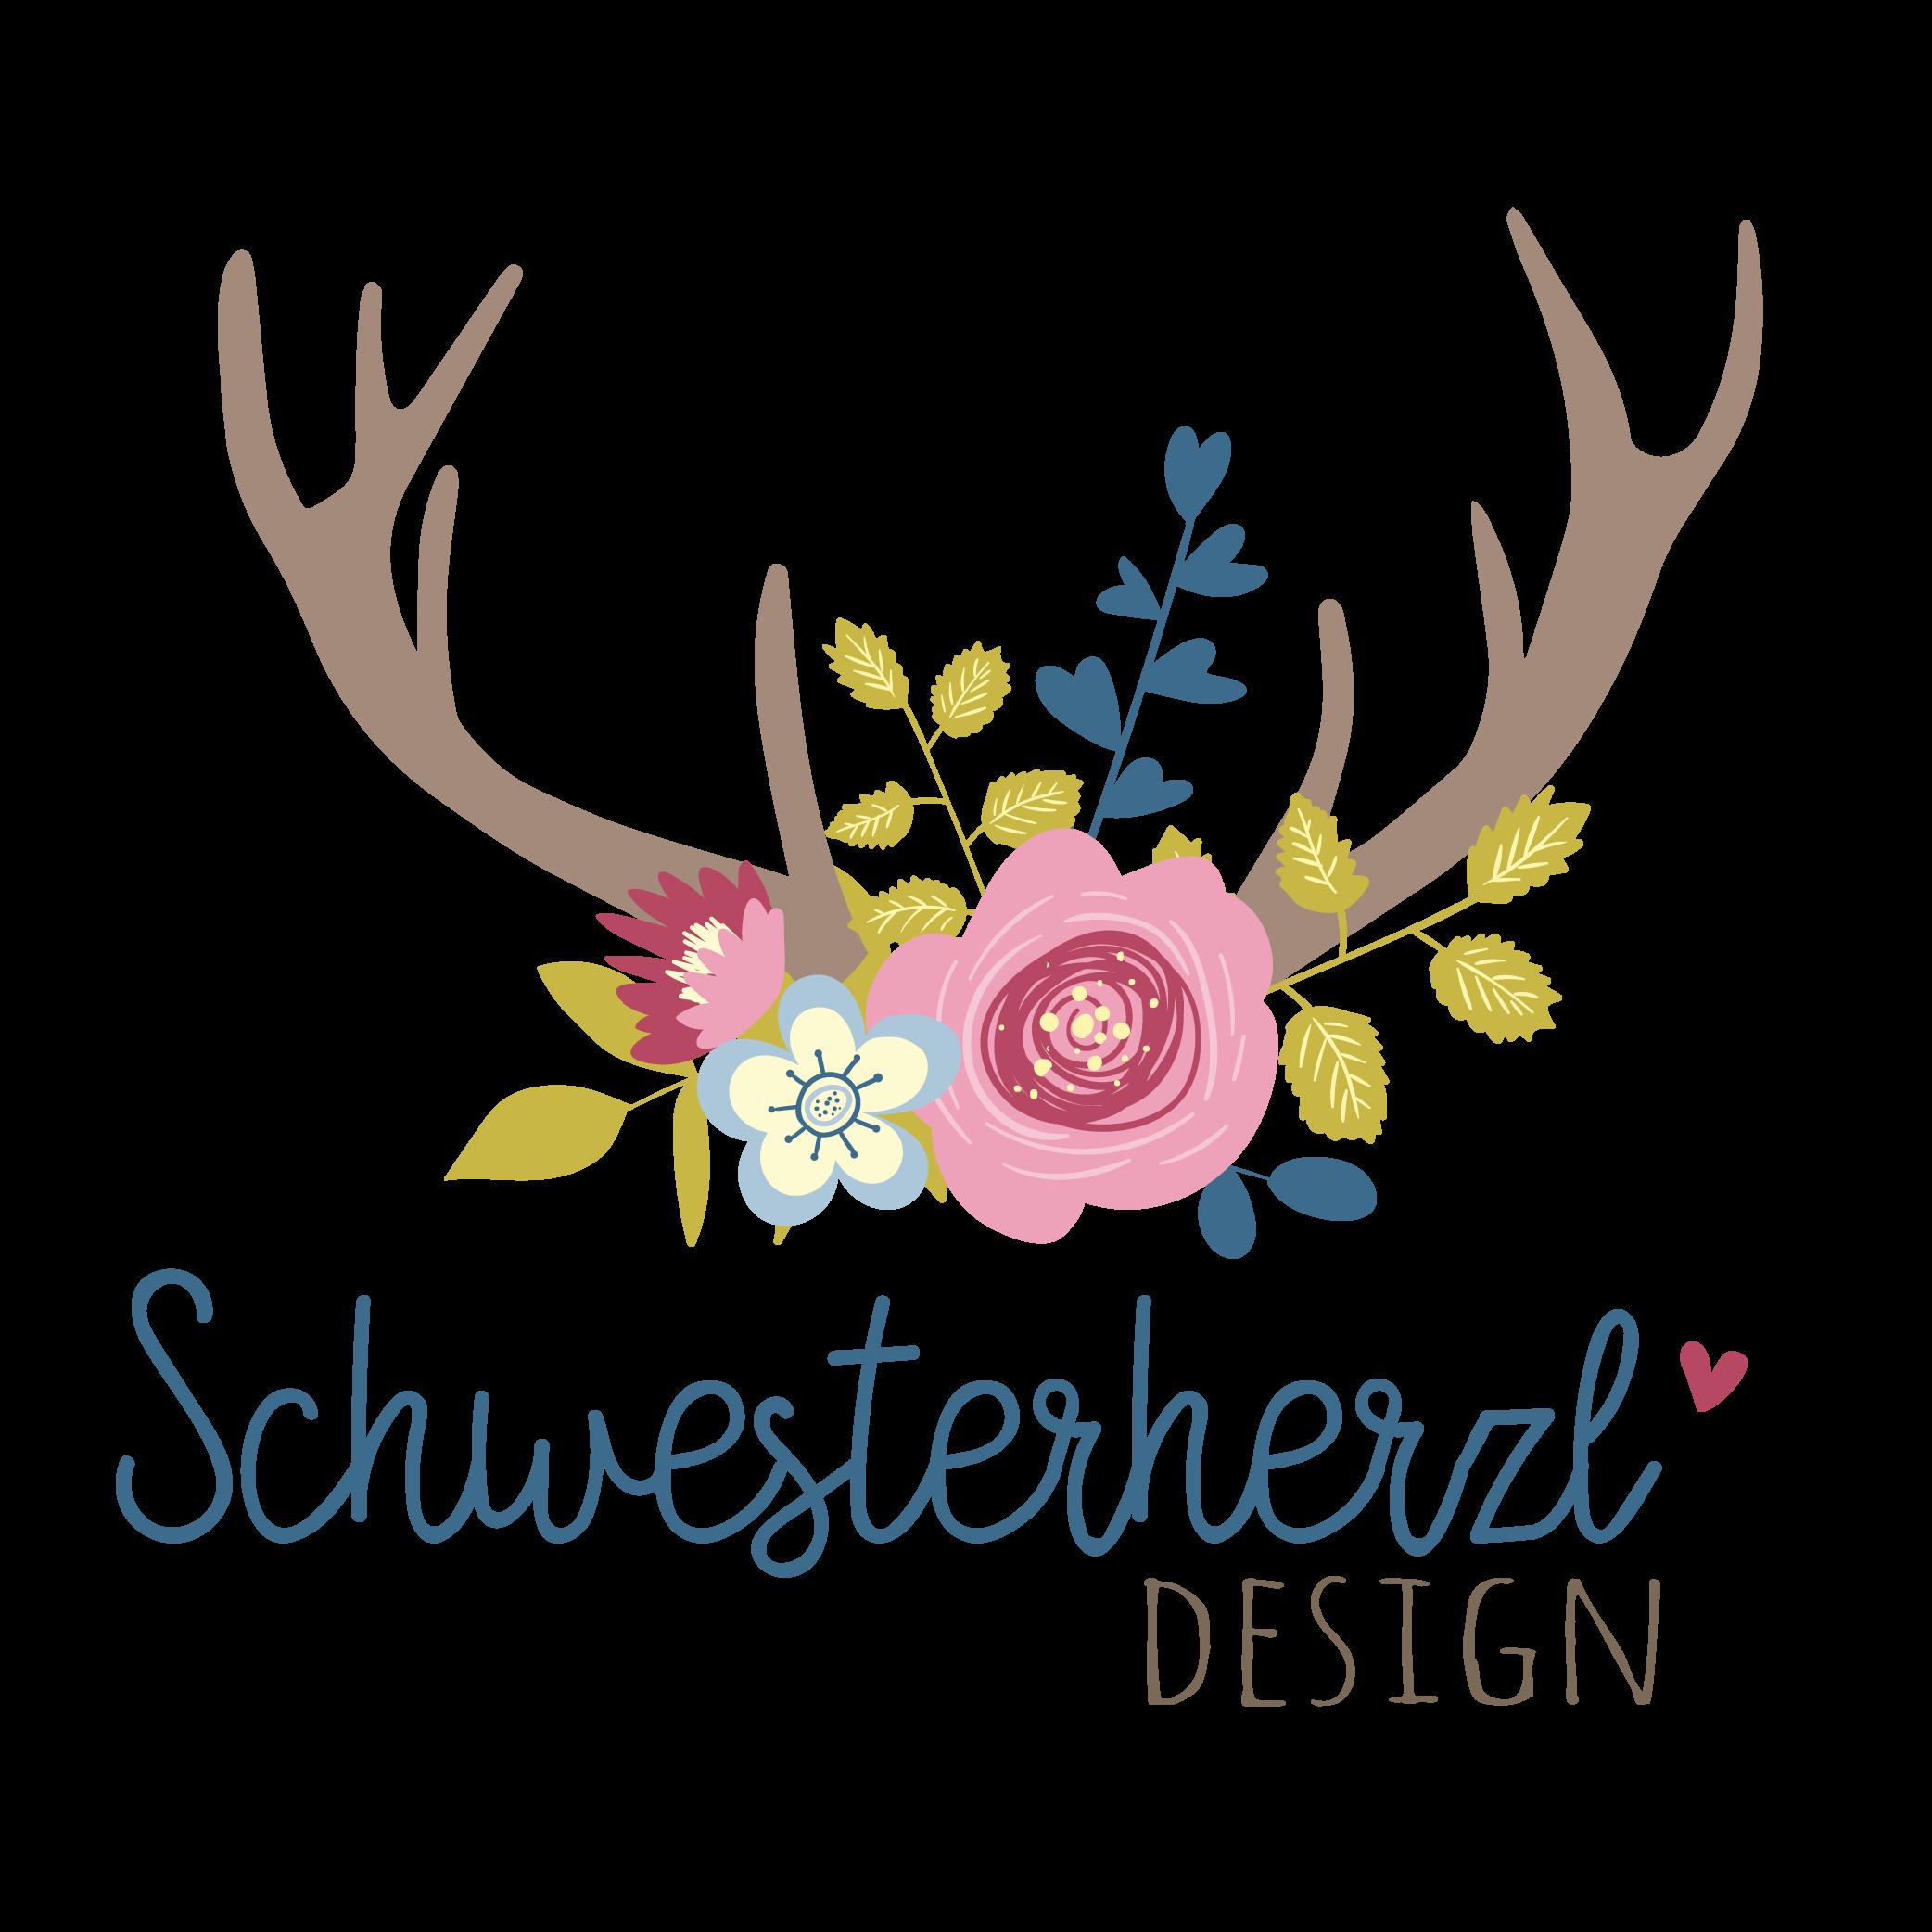 Schwesterherzl_Design_Logo-01